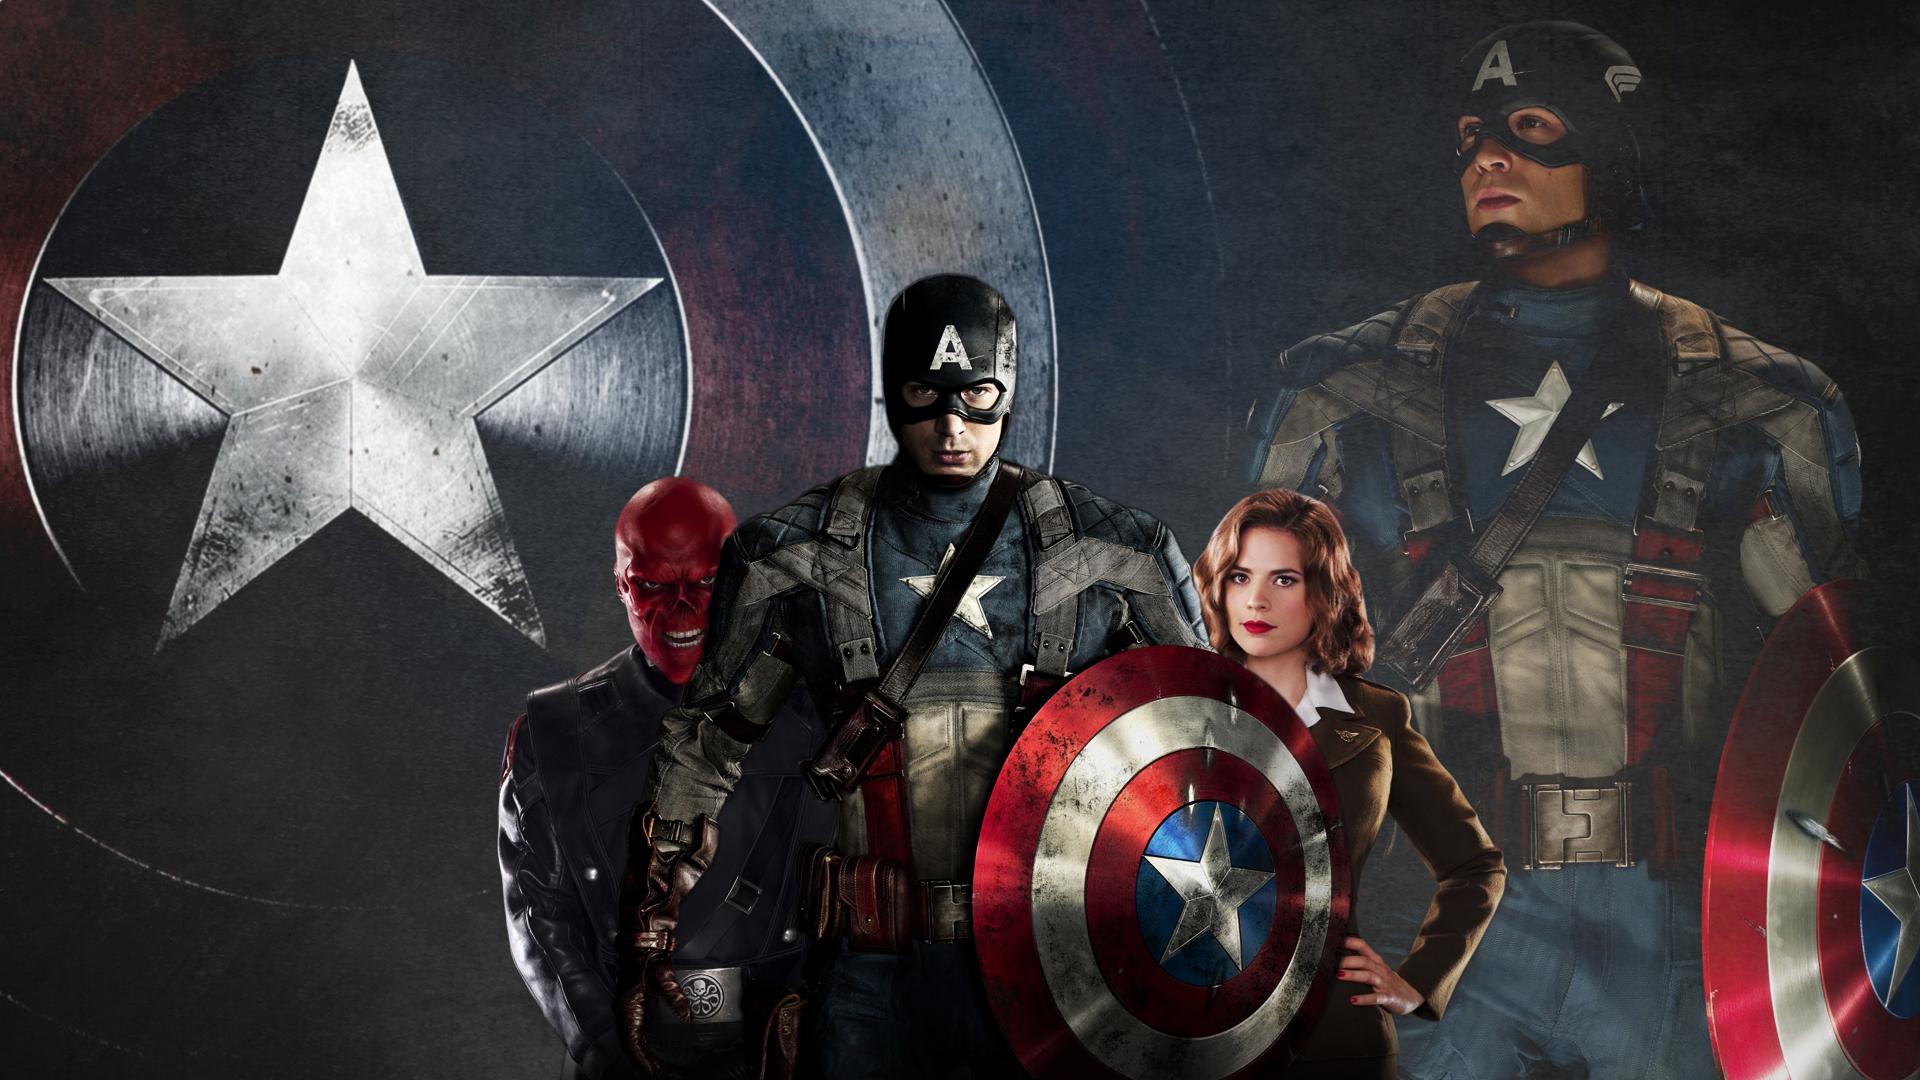 Free Download Captain America Wallpaper 1920x1080 1 Hebusorg High